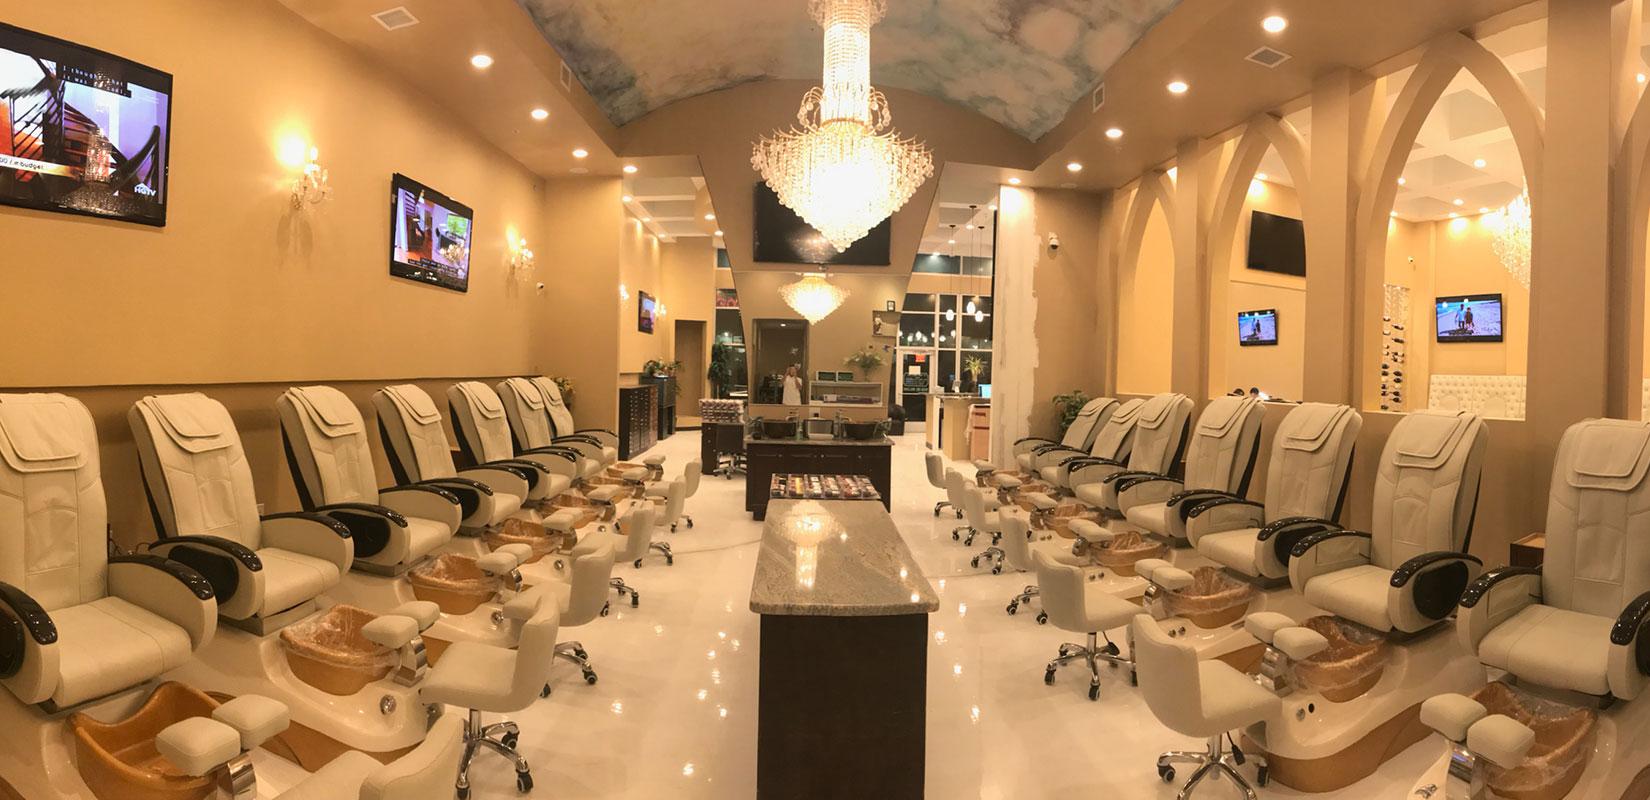 Nail Salon 79925 | D'Vine Nail Spa of El Paso, TX 79925